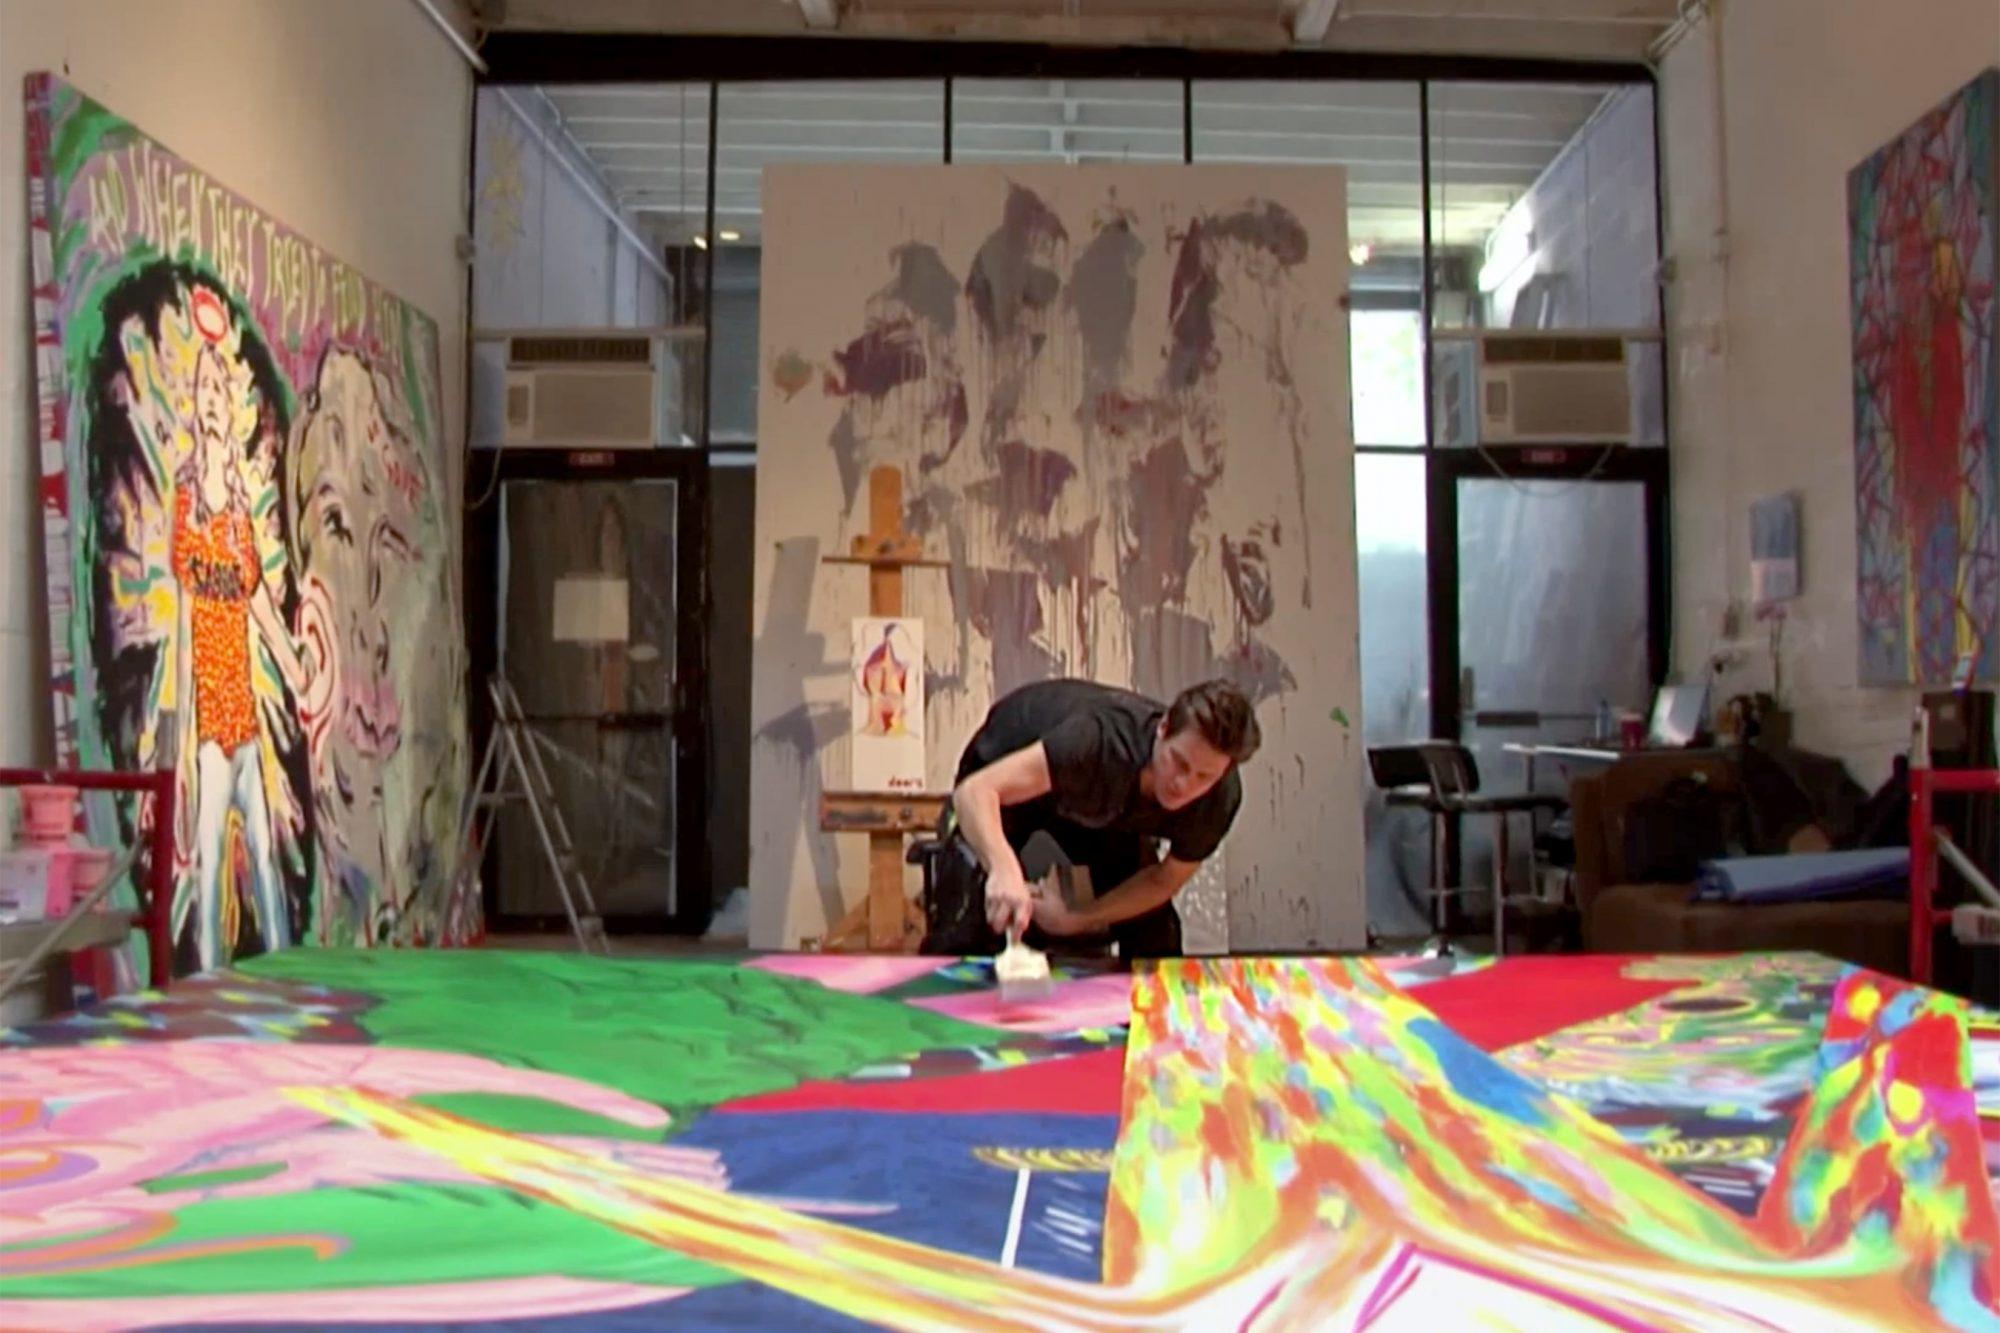 Jim Carey: I Need Color